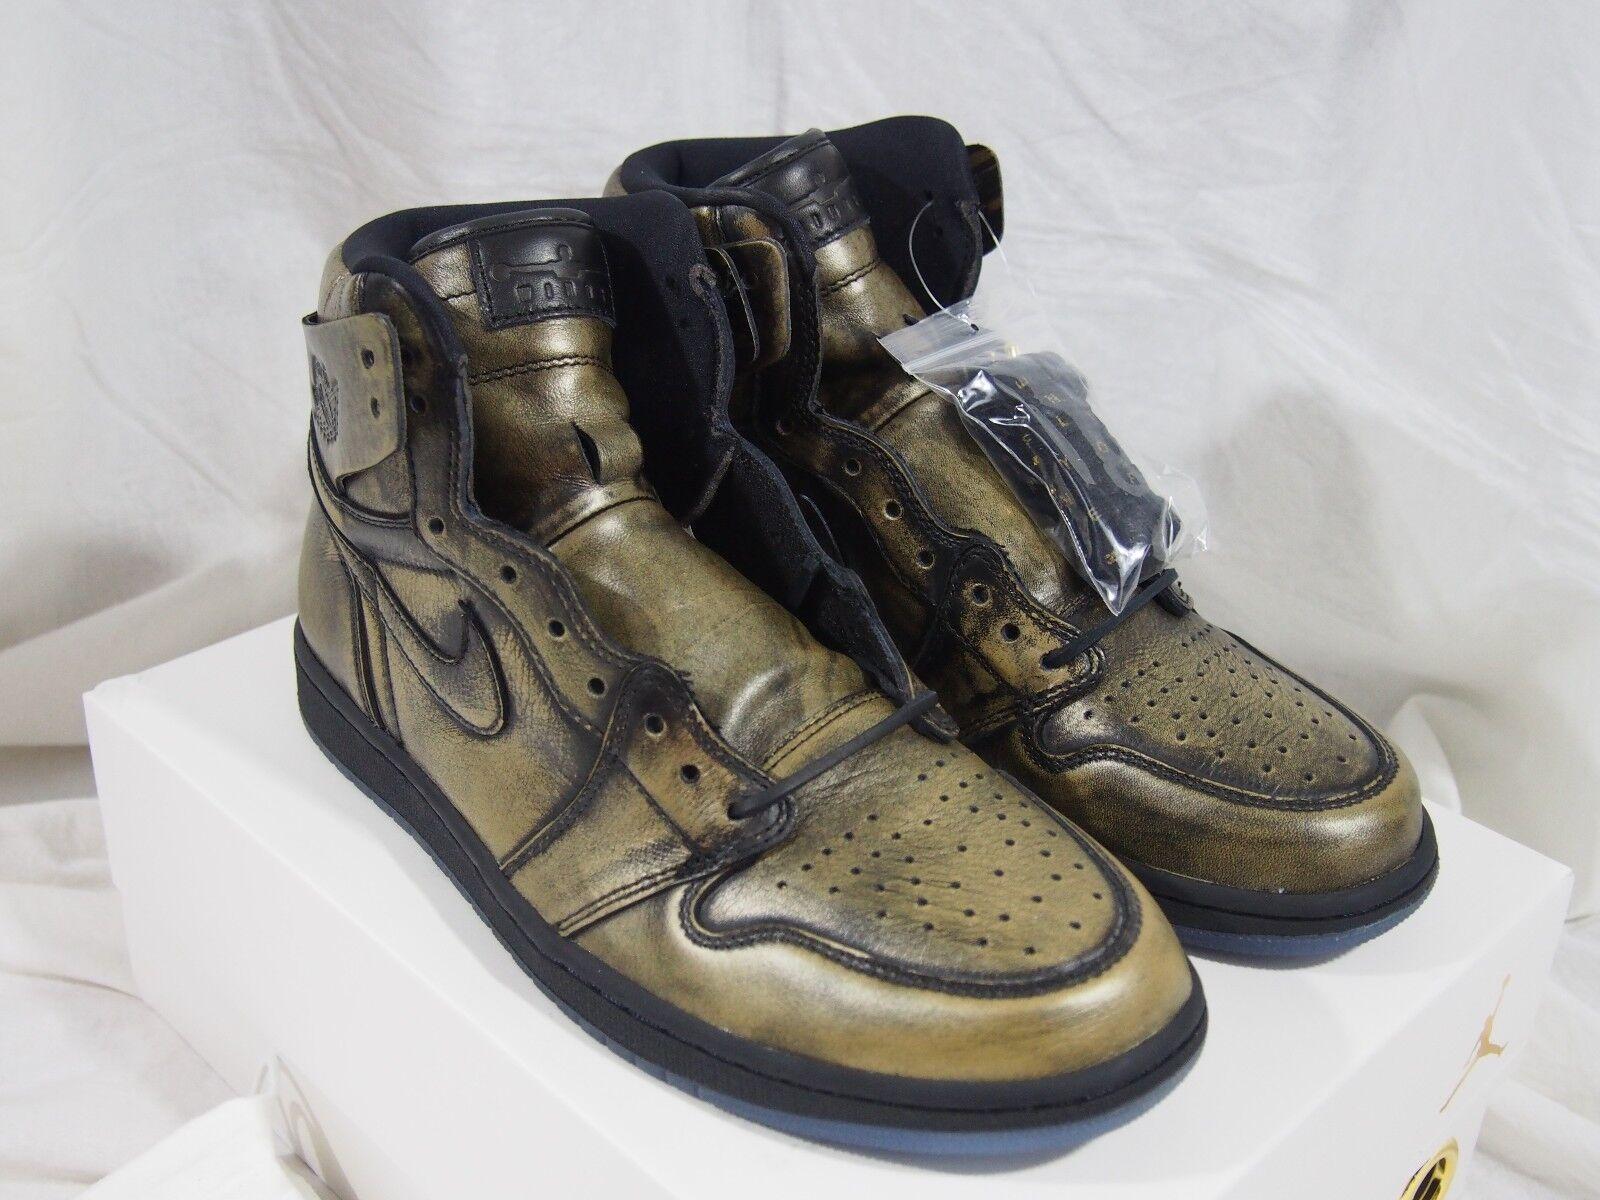 Nike Air Jordan 1 High OG 'Wings